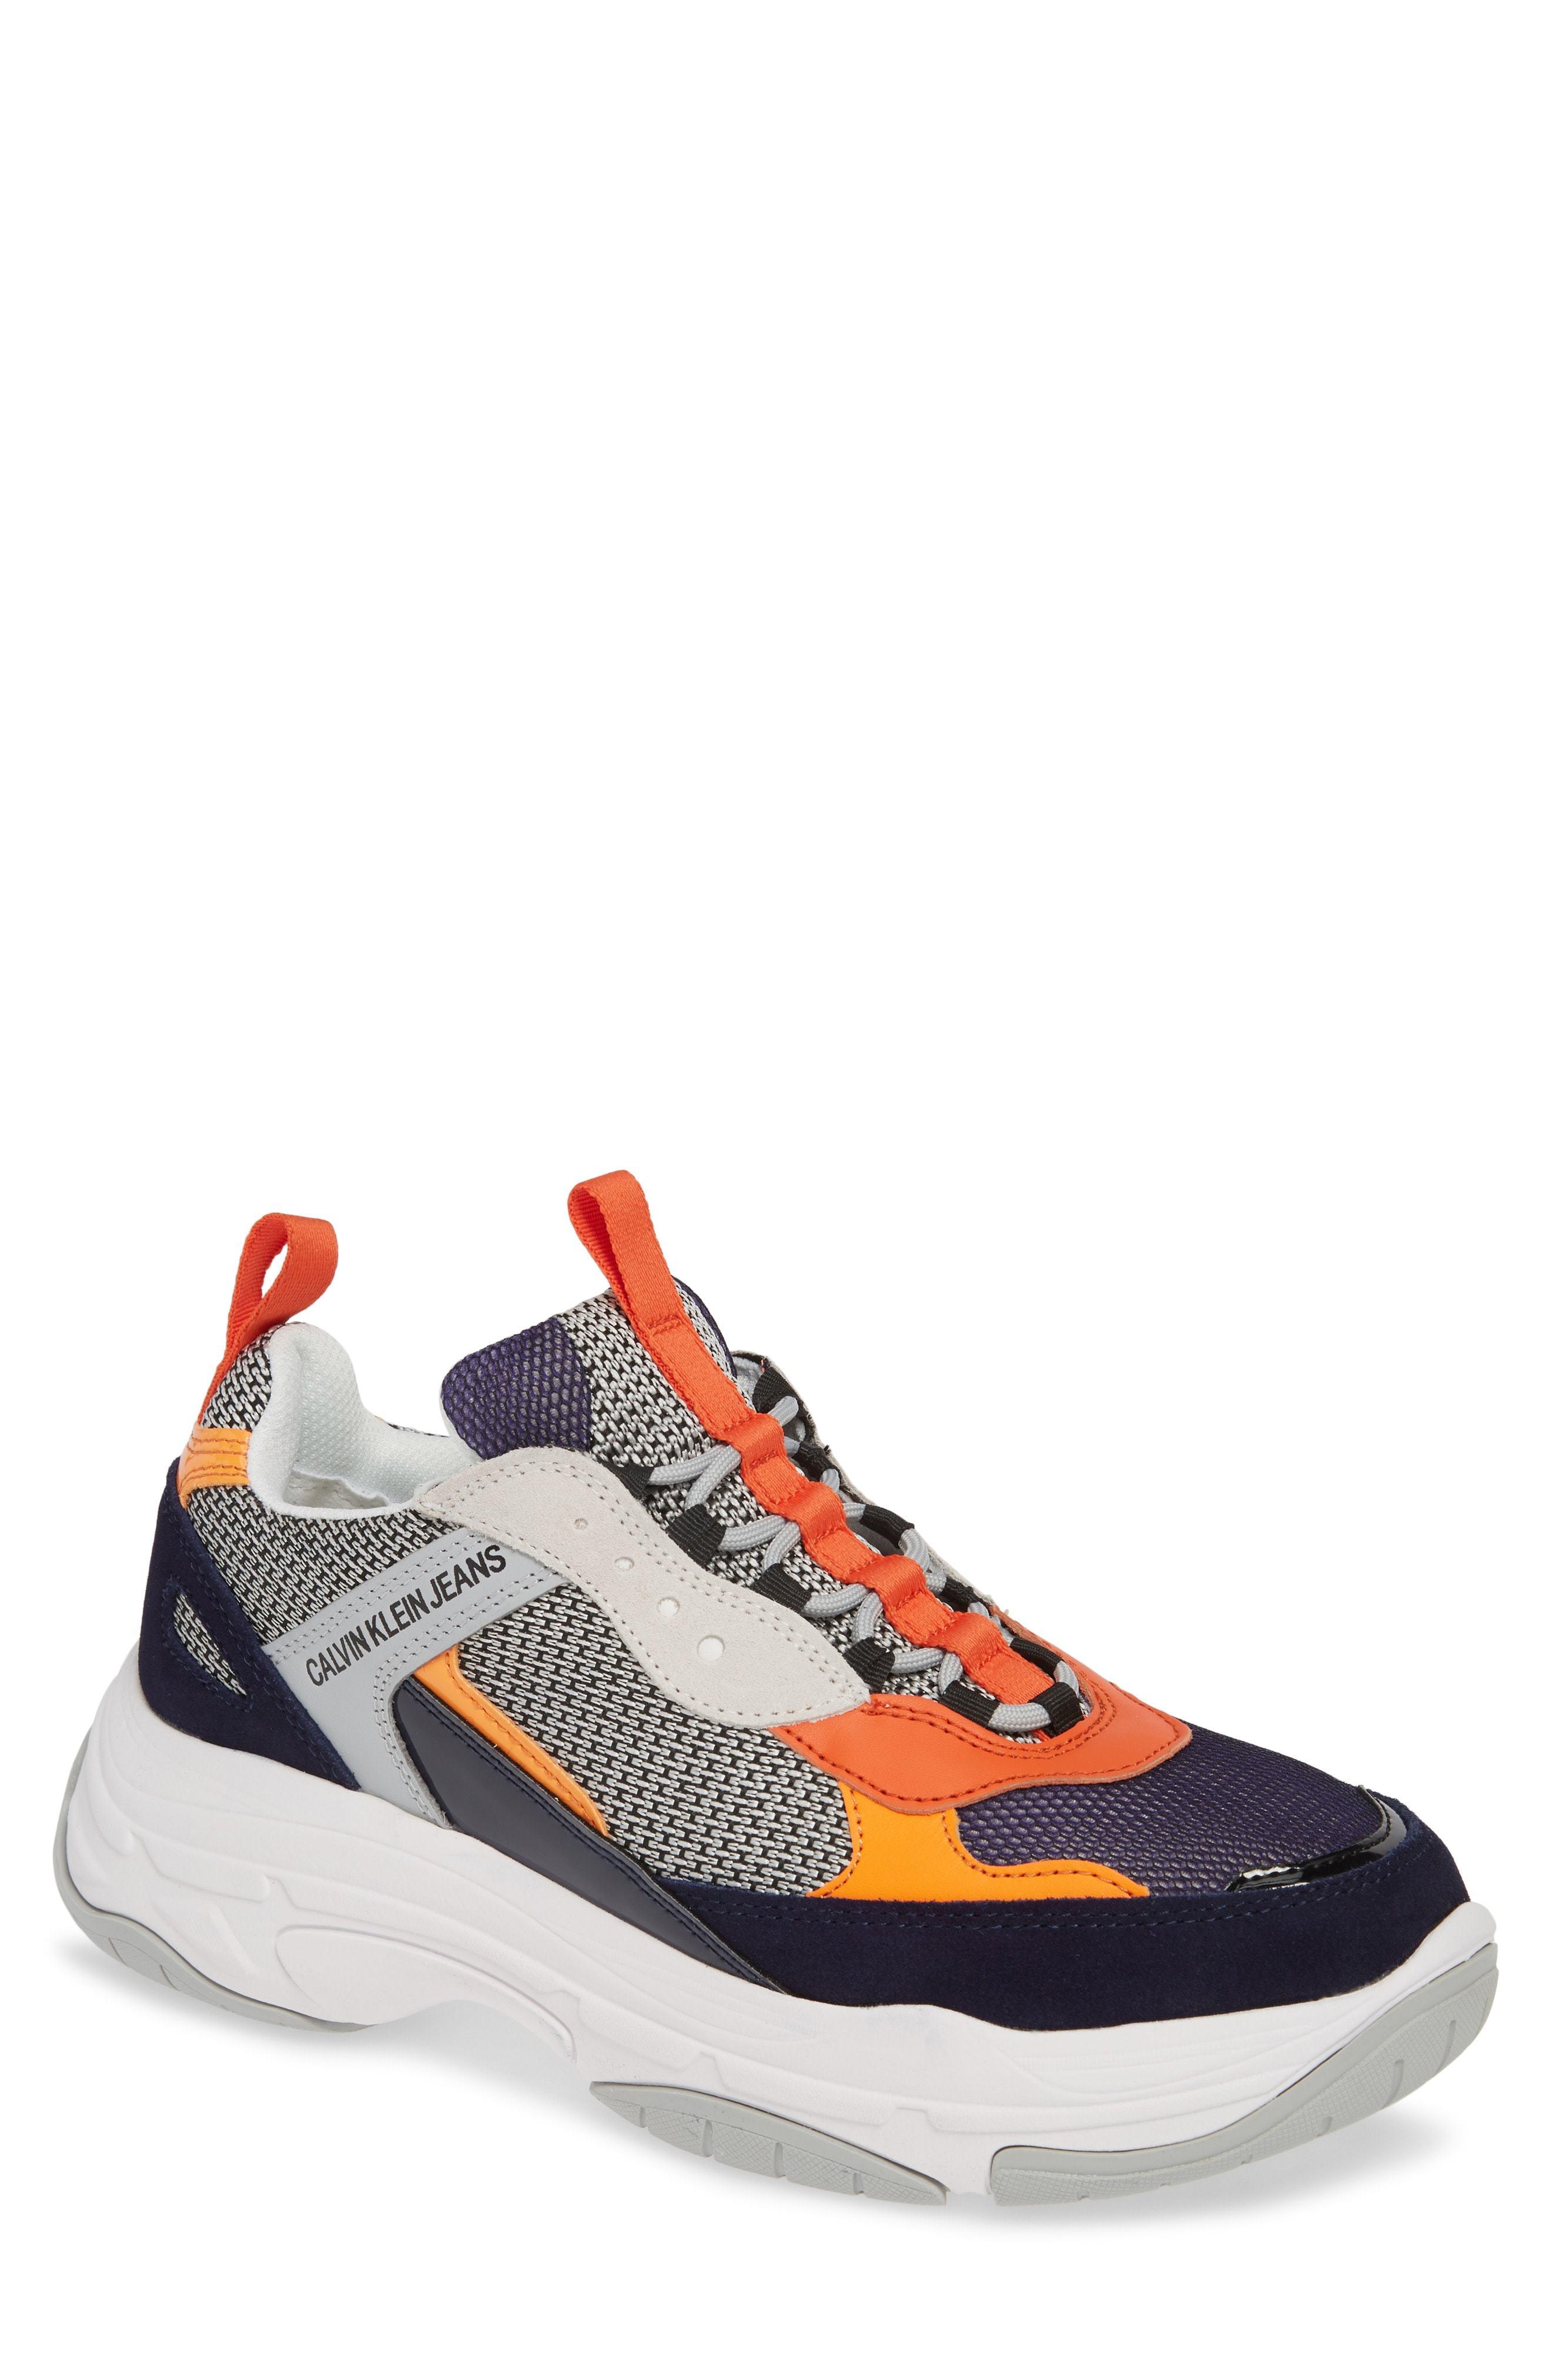 Calvin Klein Jeans Marvin Sneaker, $159